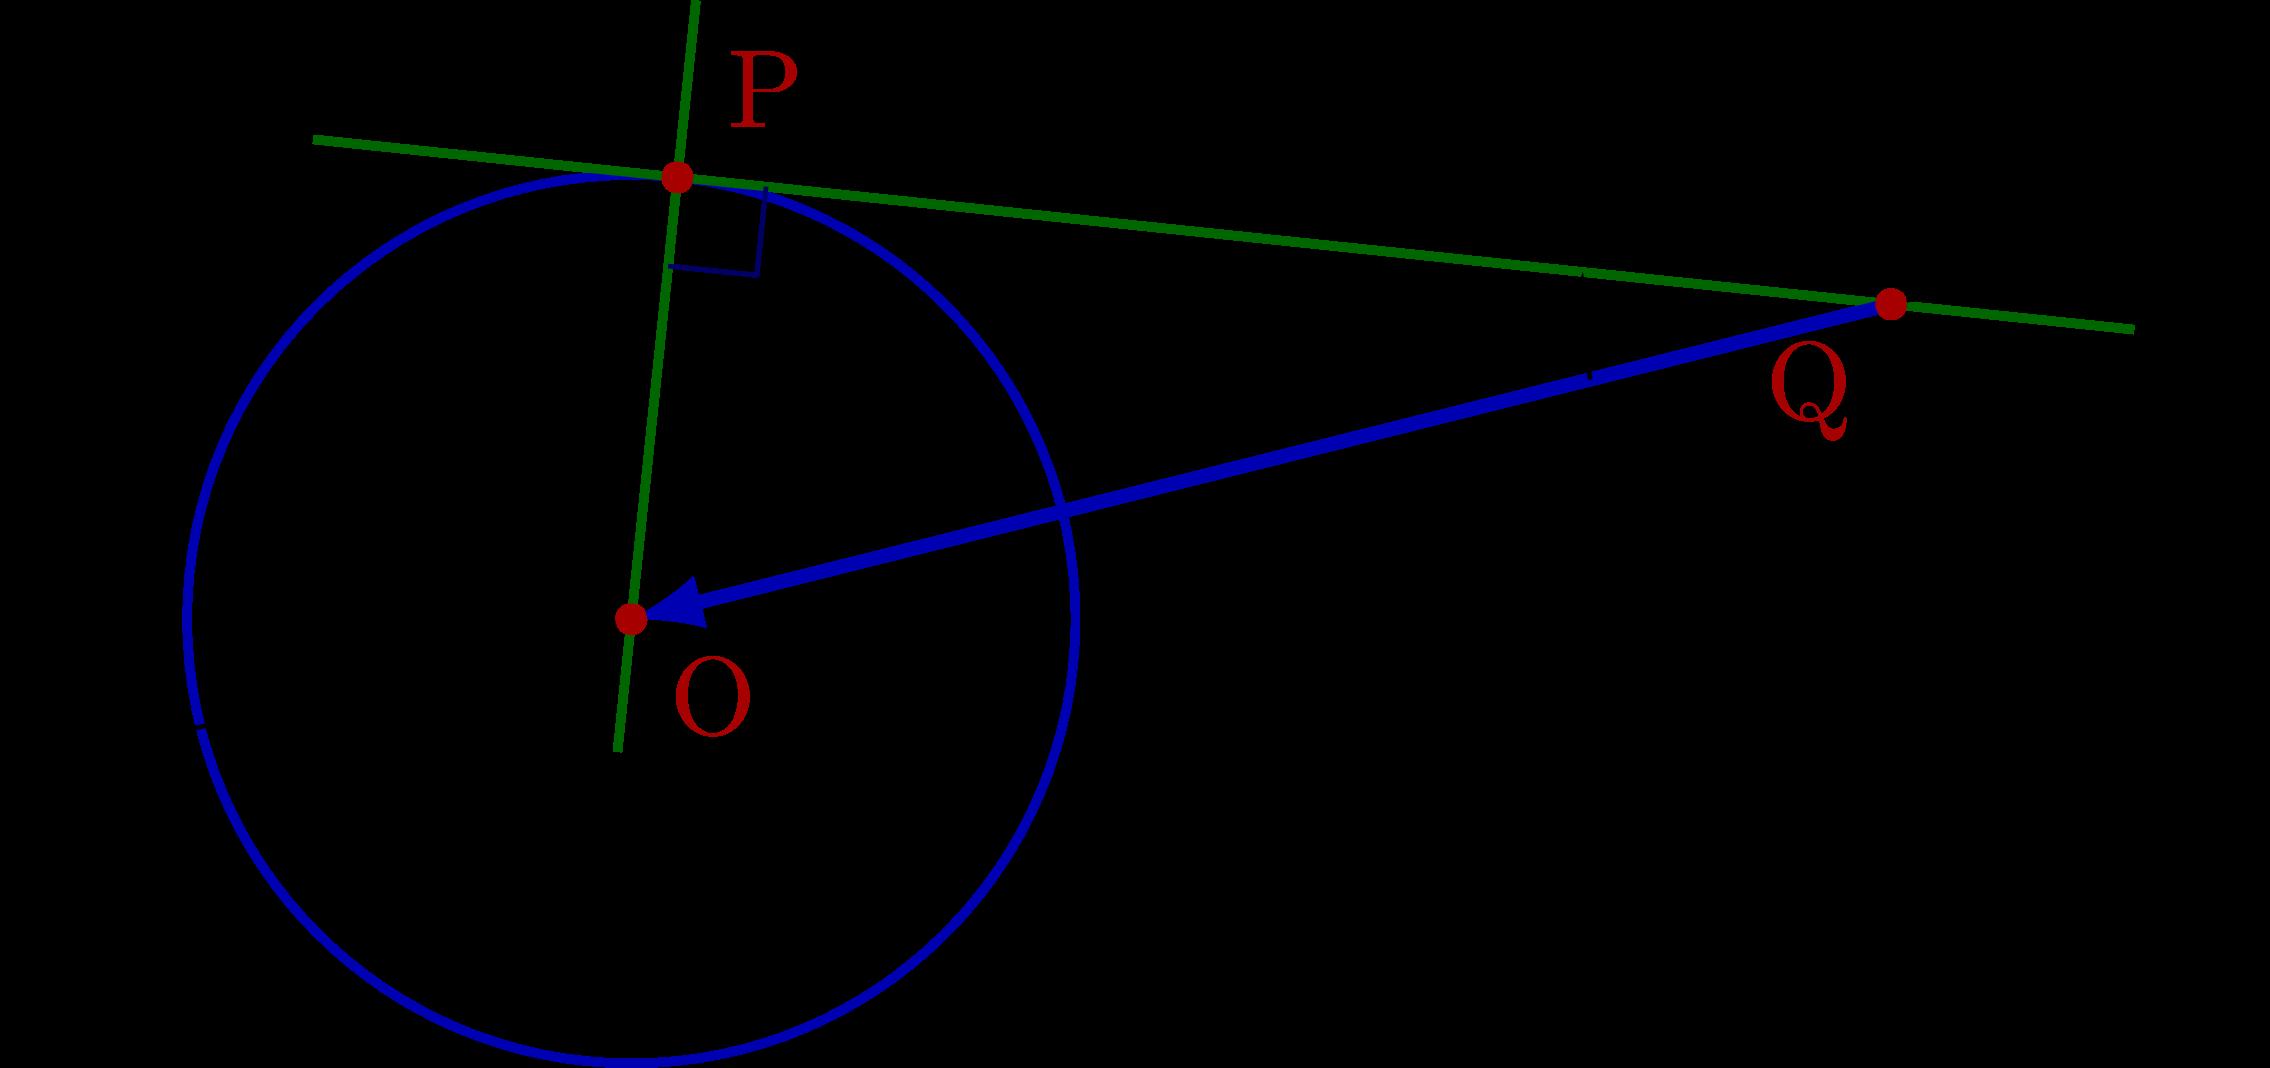 circle_tangent-006.png